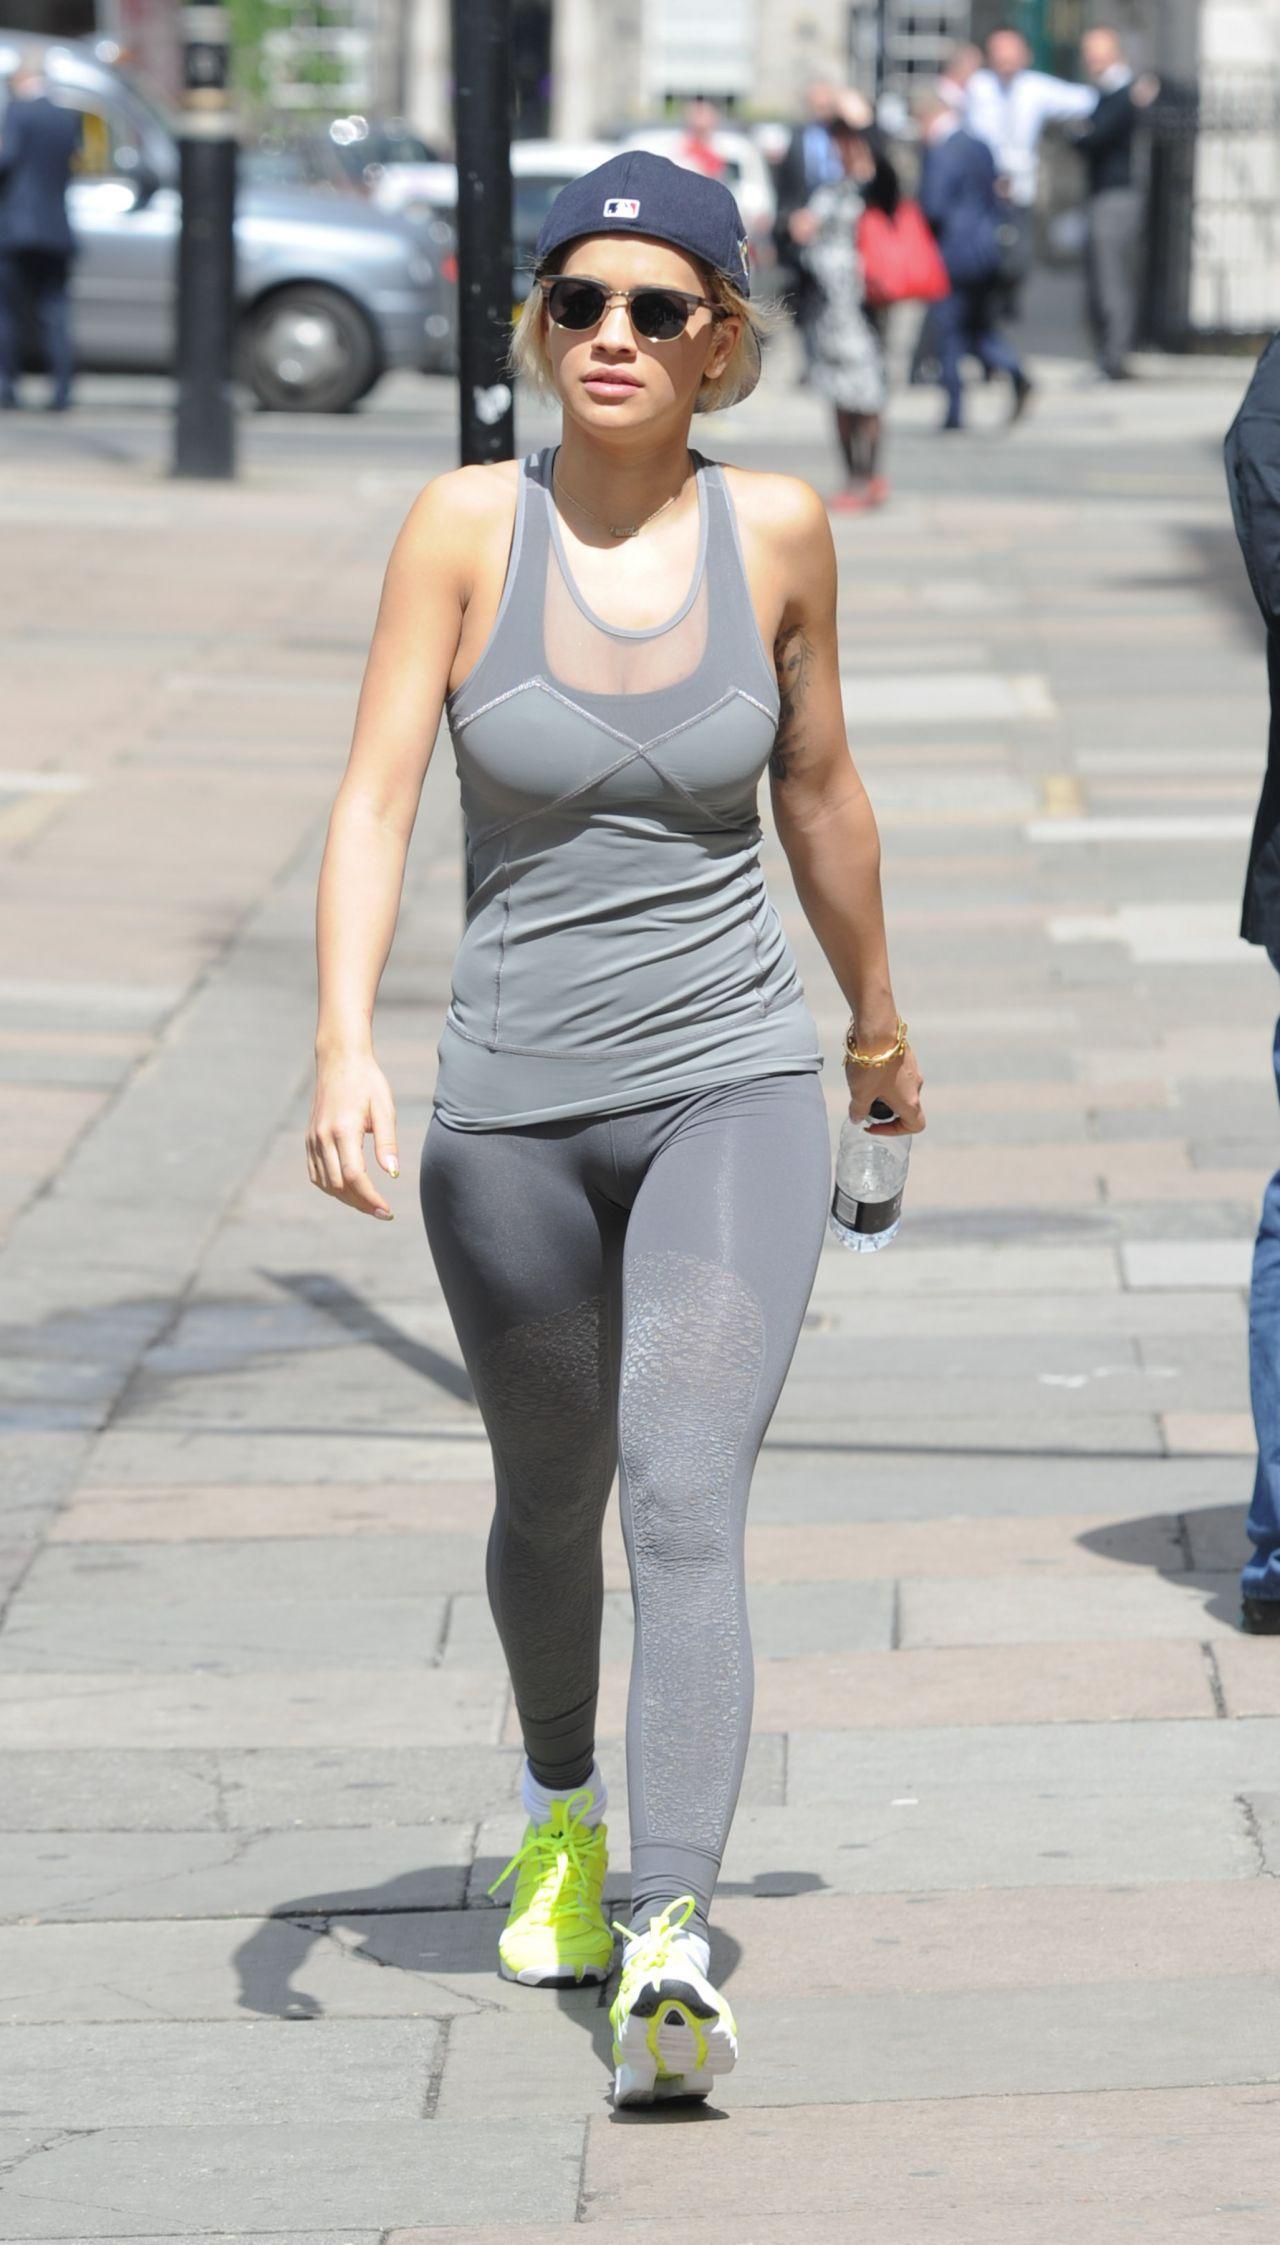 Rita Ora in Tights at a Gym in London - May 2014